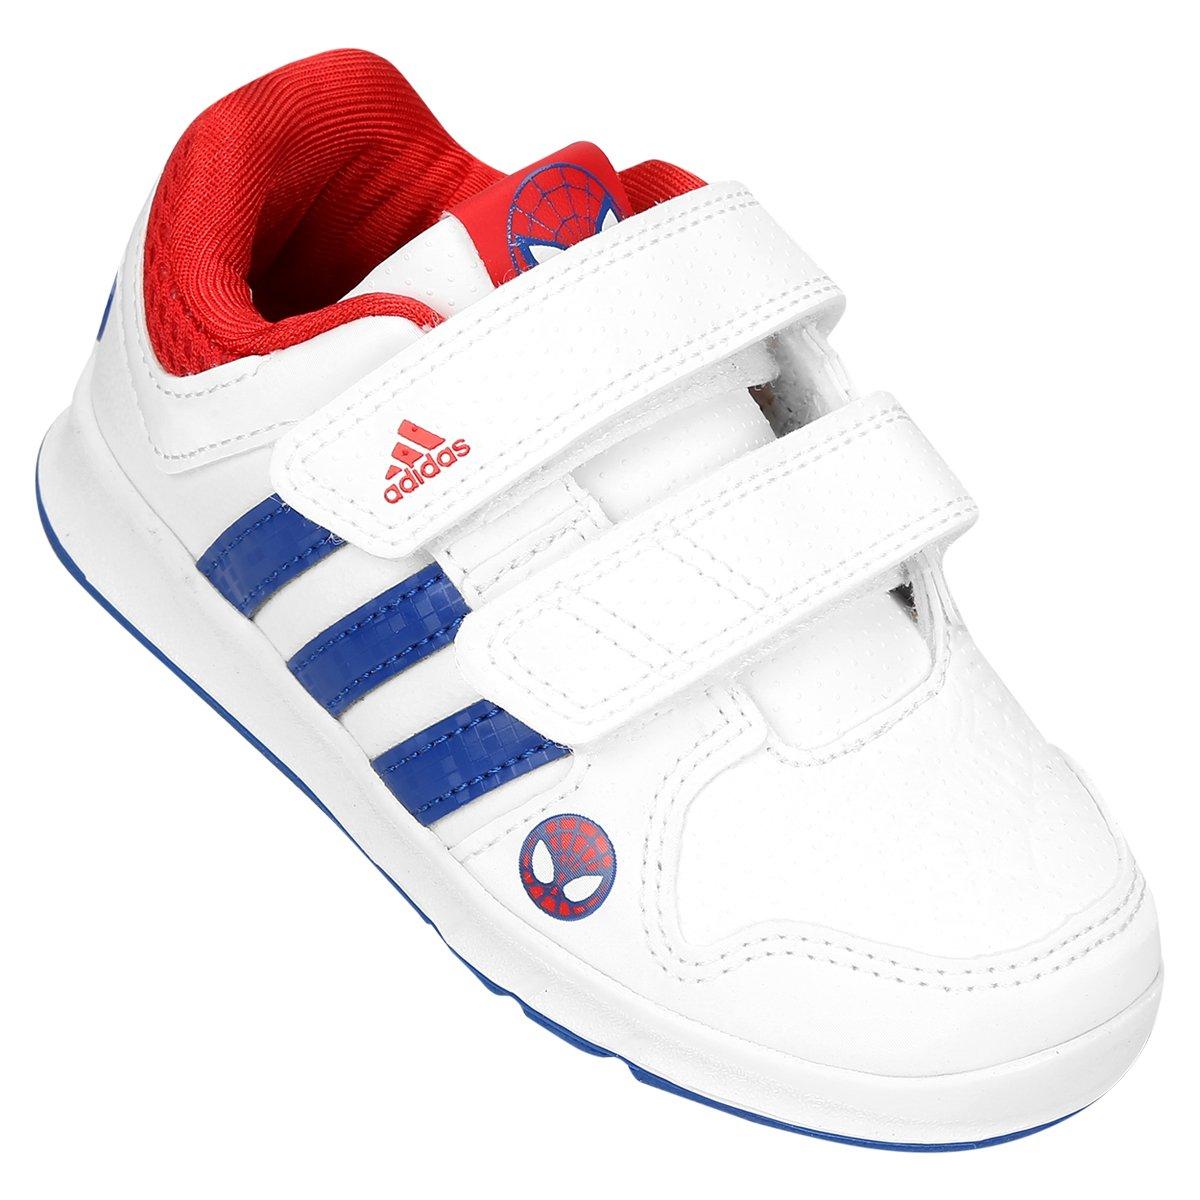 407d74b862a Tênis Adidas Lk Spider Man Cf Infantil - Compre Agora